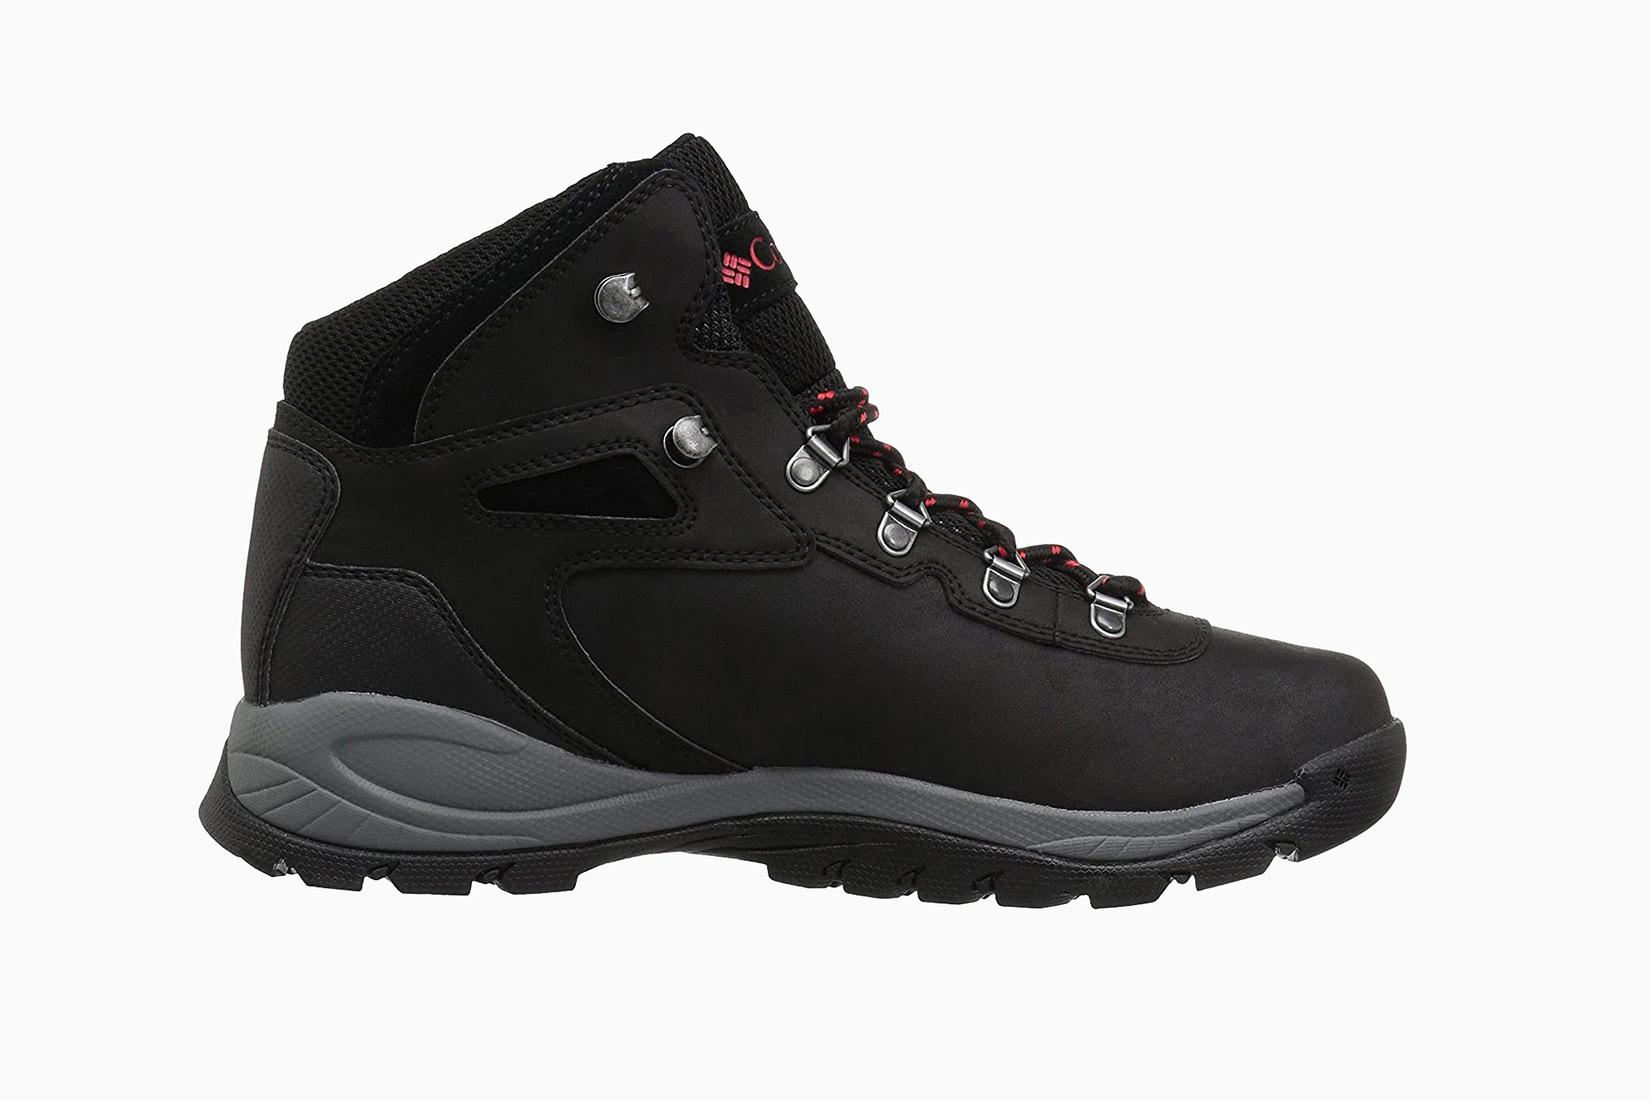 best women walking shoes columbia newton ridge hiking boots - Luxe Digital